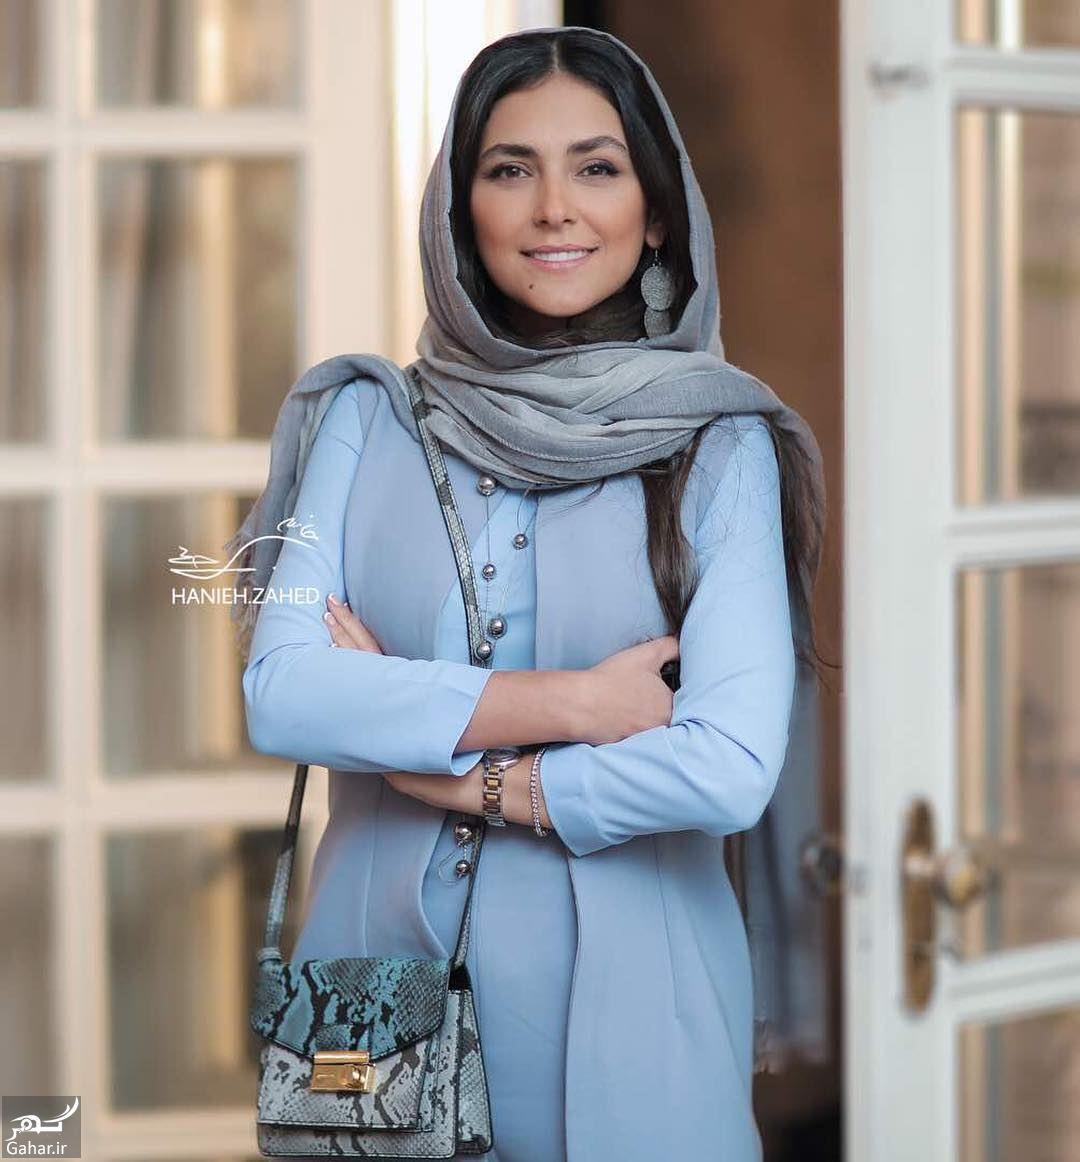 236177 Gahar ir استایل جذاب هدی زین العابدین در یک مراسم / تصاویر